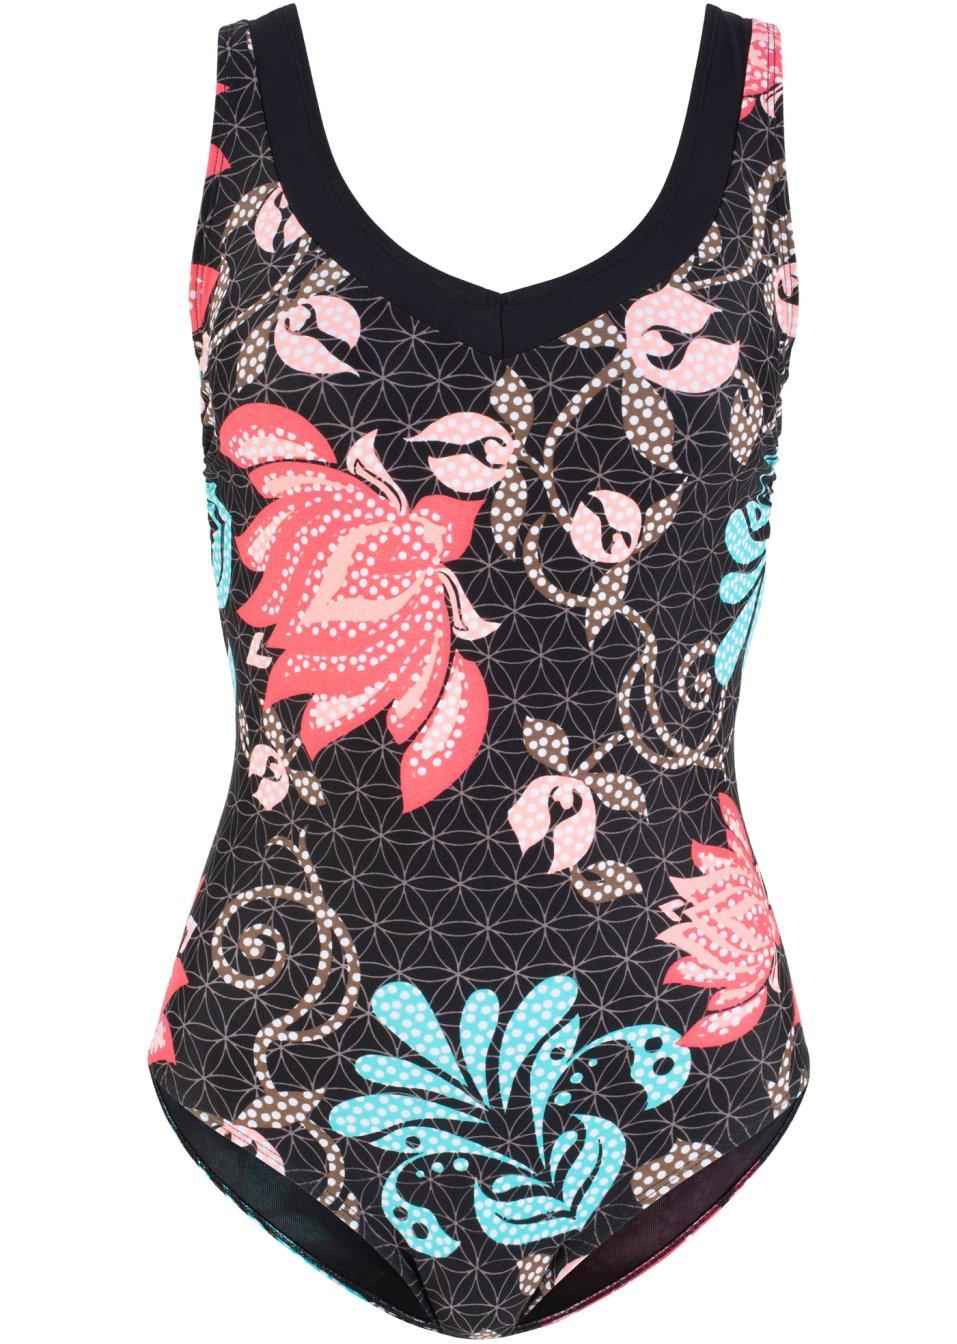 Attraktiver Shape Badeanzug aus figurformendem Material - schwarz/rosa mR2GQ Jz5Nc